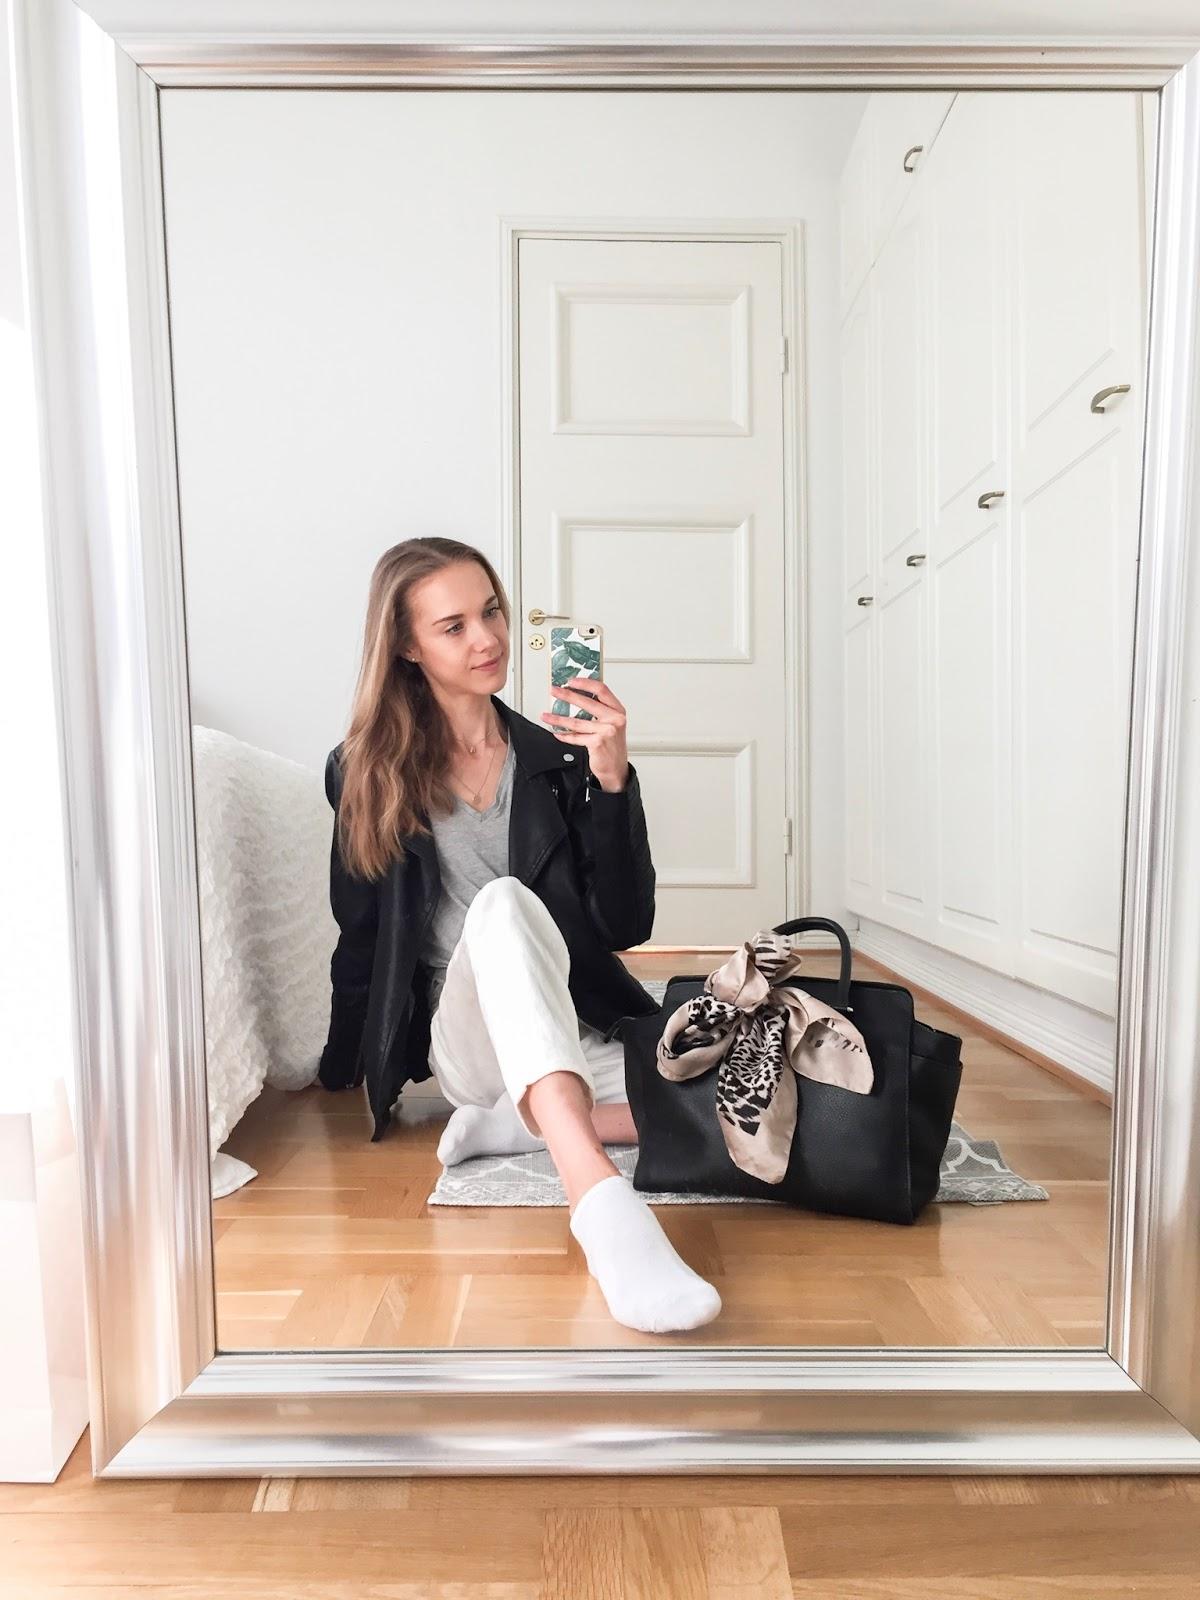 fashion-blogger-real-outfit-muotibloggaaja-arkiasu